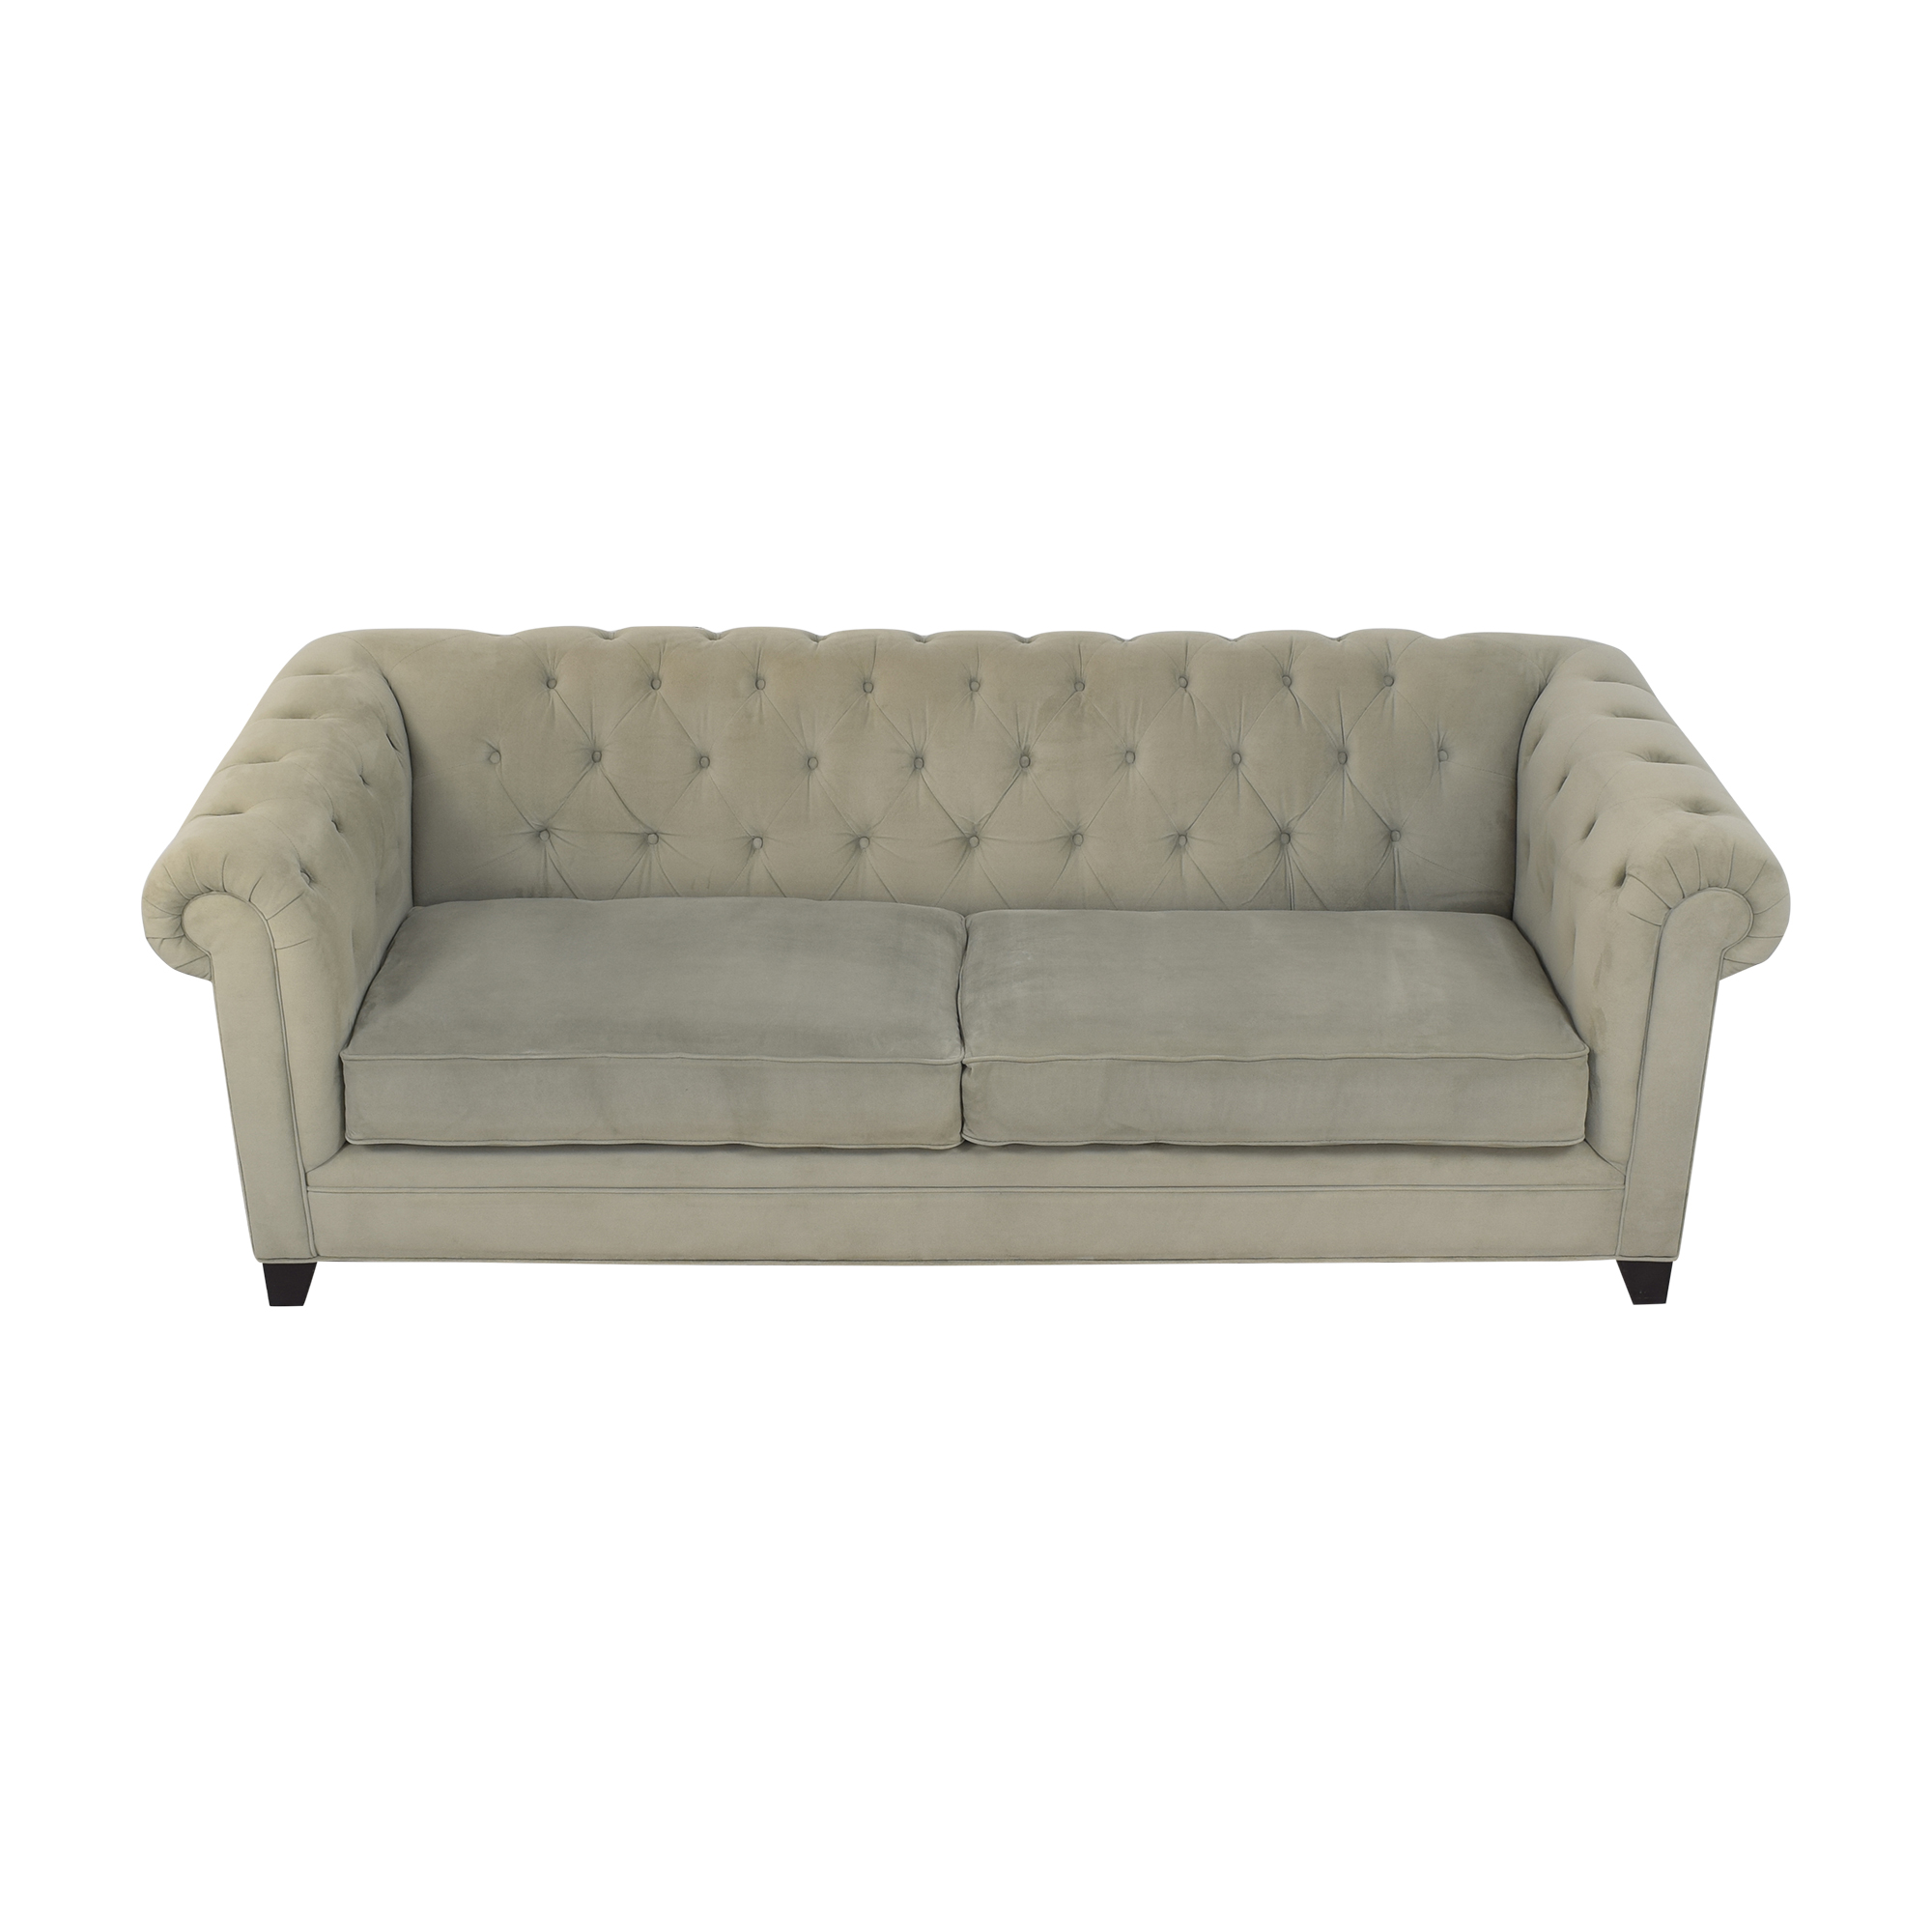 Macy's Macy's Martha Stewart Collection Saybridge Chesterfield Sofa used